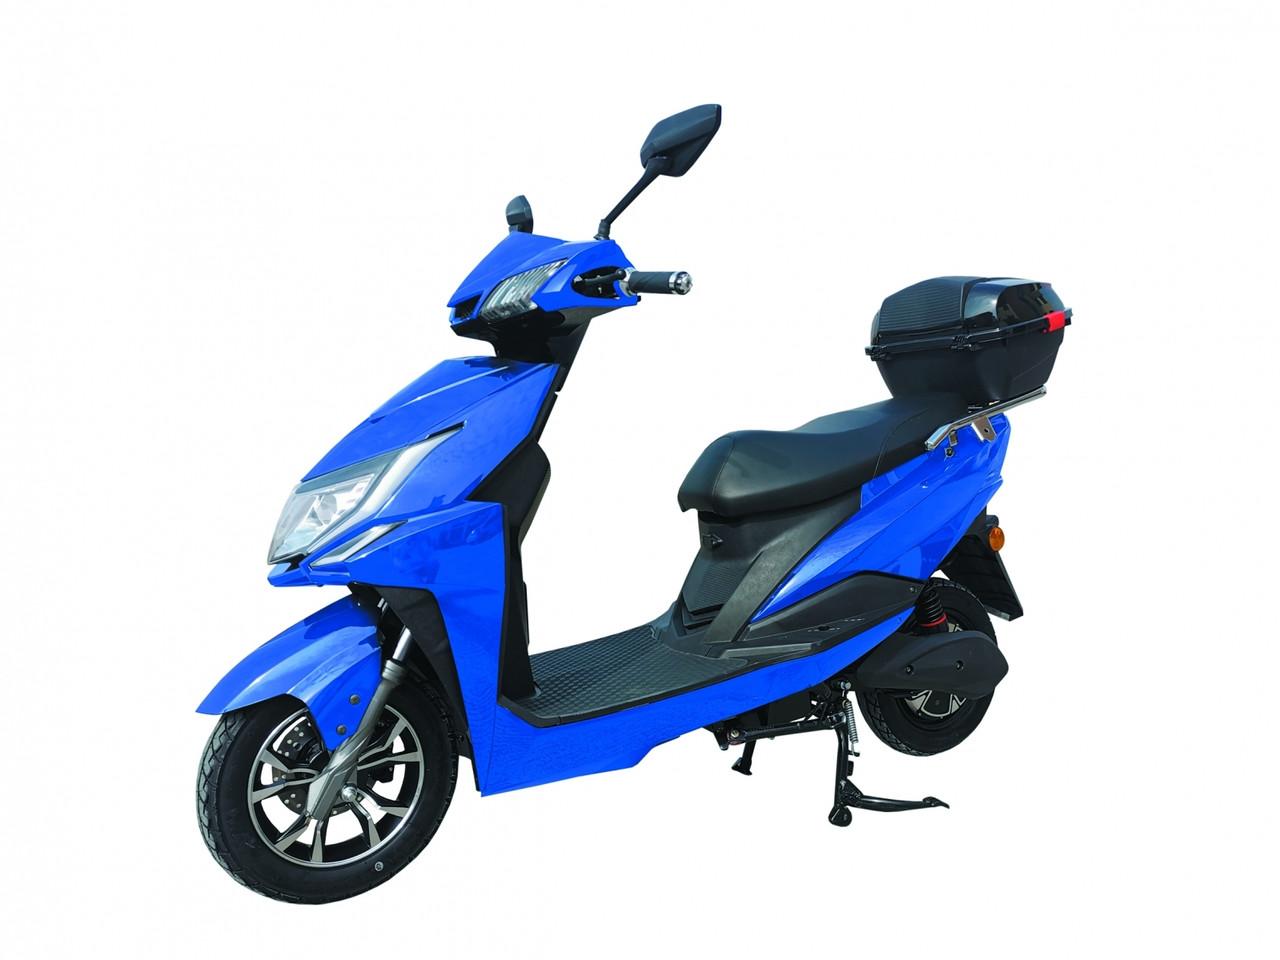 Электроскутер BN-WF, 72В 20А, 1000Вт, синий